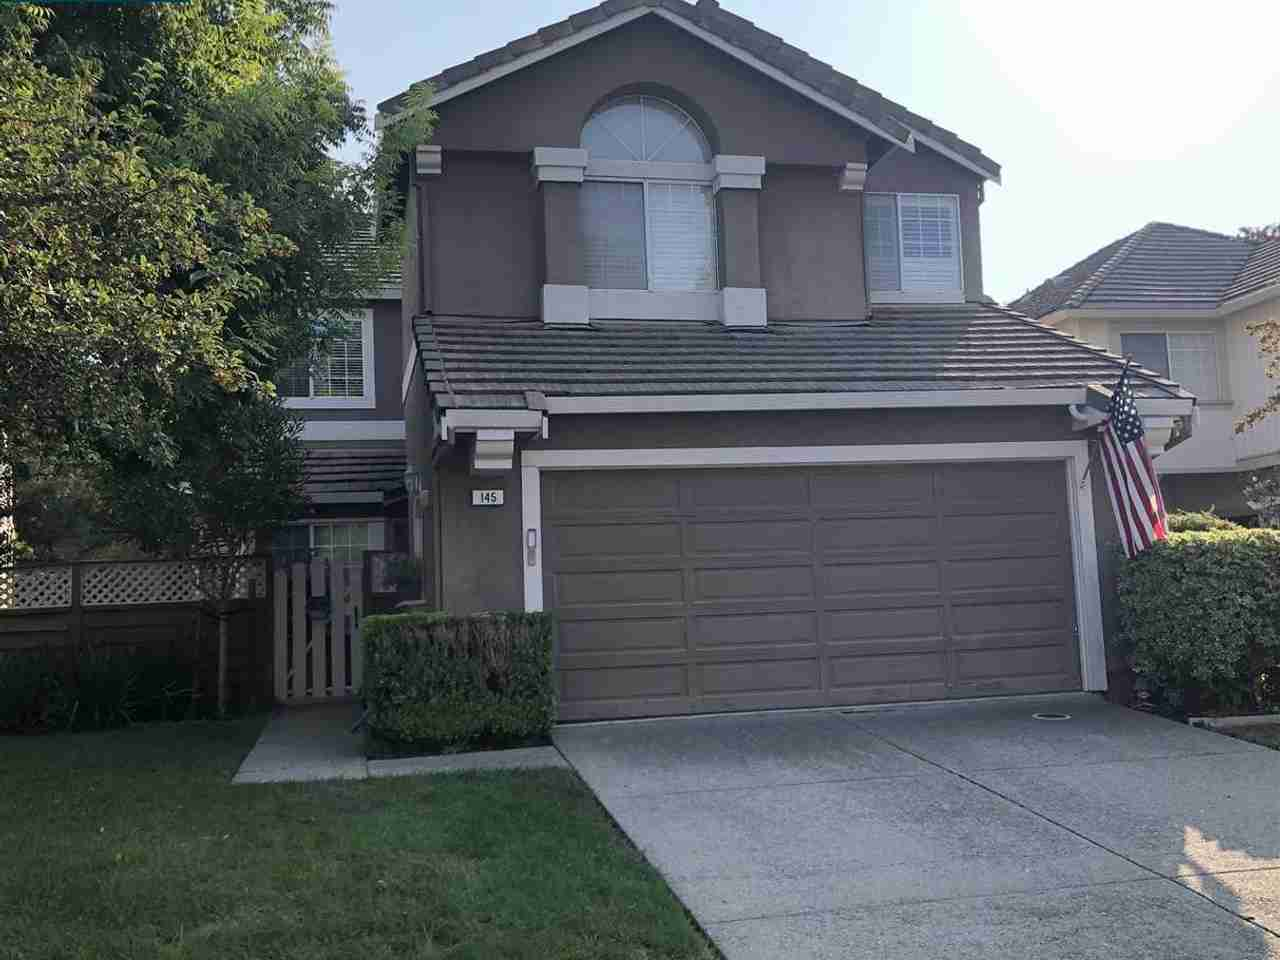 145 Gardner Place Danville, CA, 94526